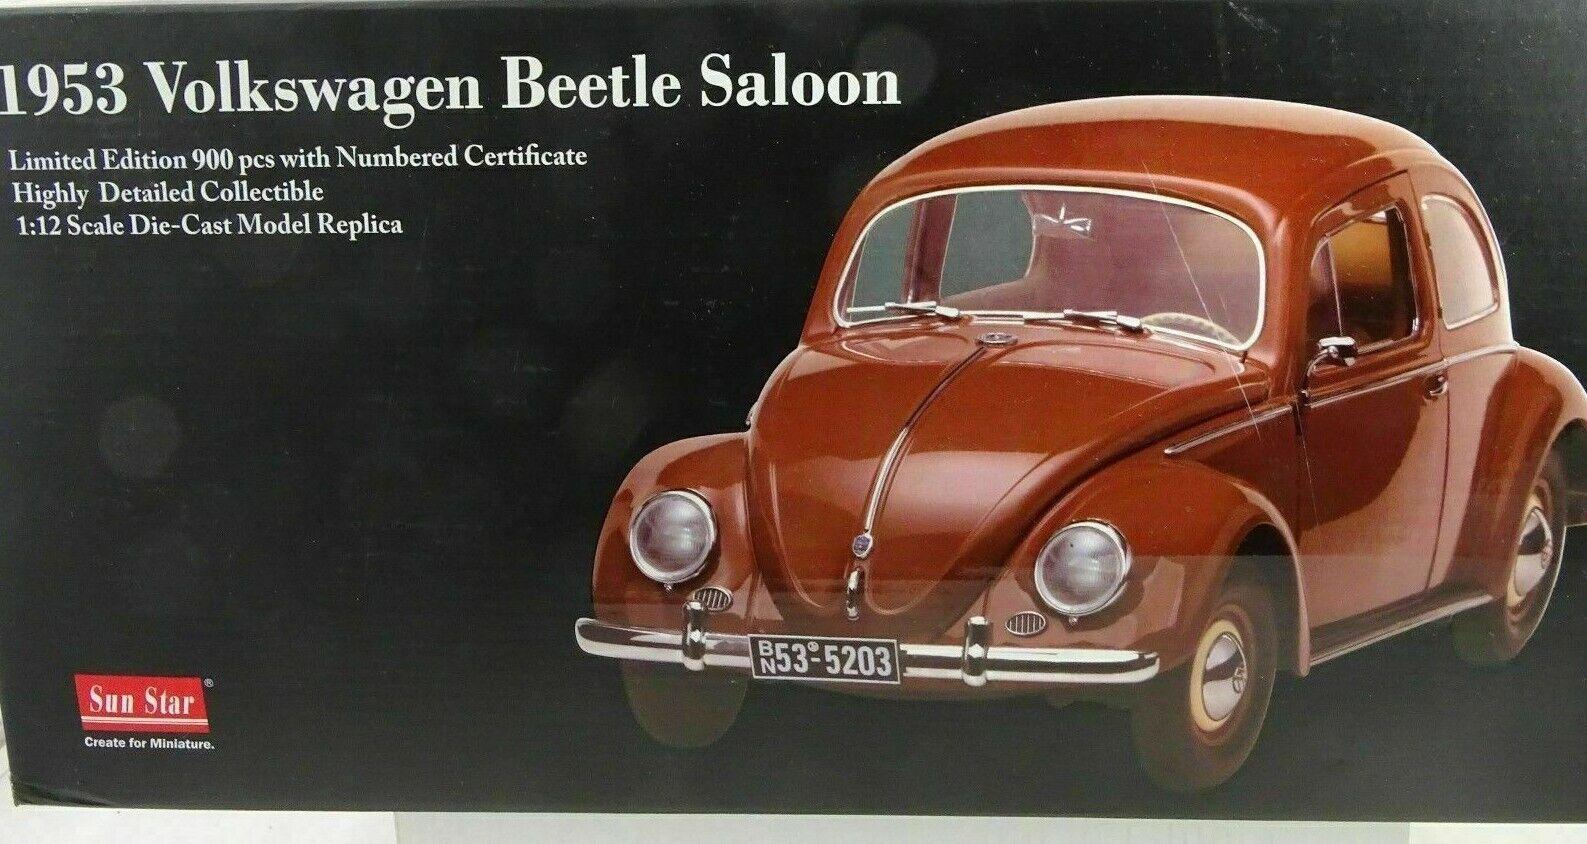 1 12 SUN STAR  5203 - 1953 Volkswagen VW Beetle Beetle Saloon Marron Lmtd. 900st